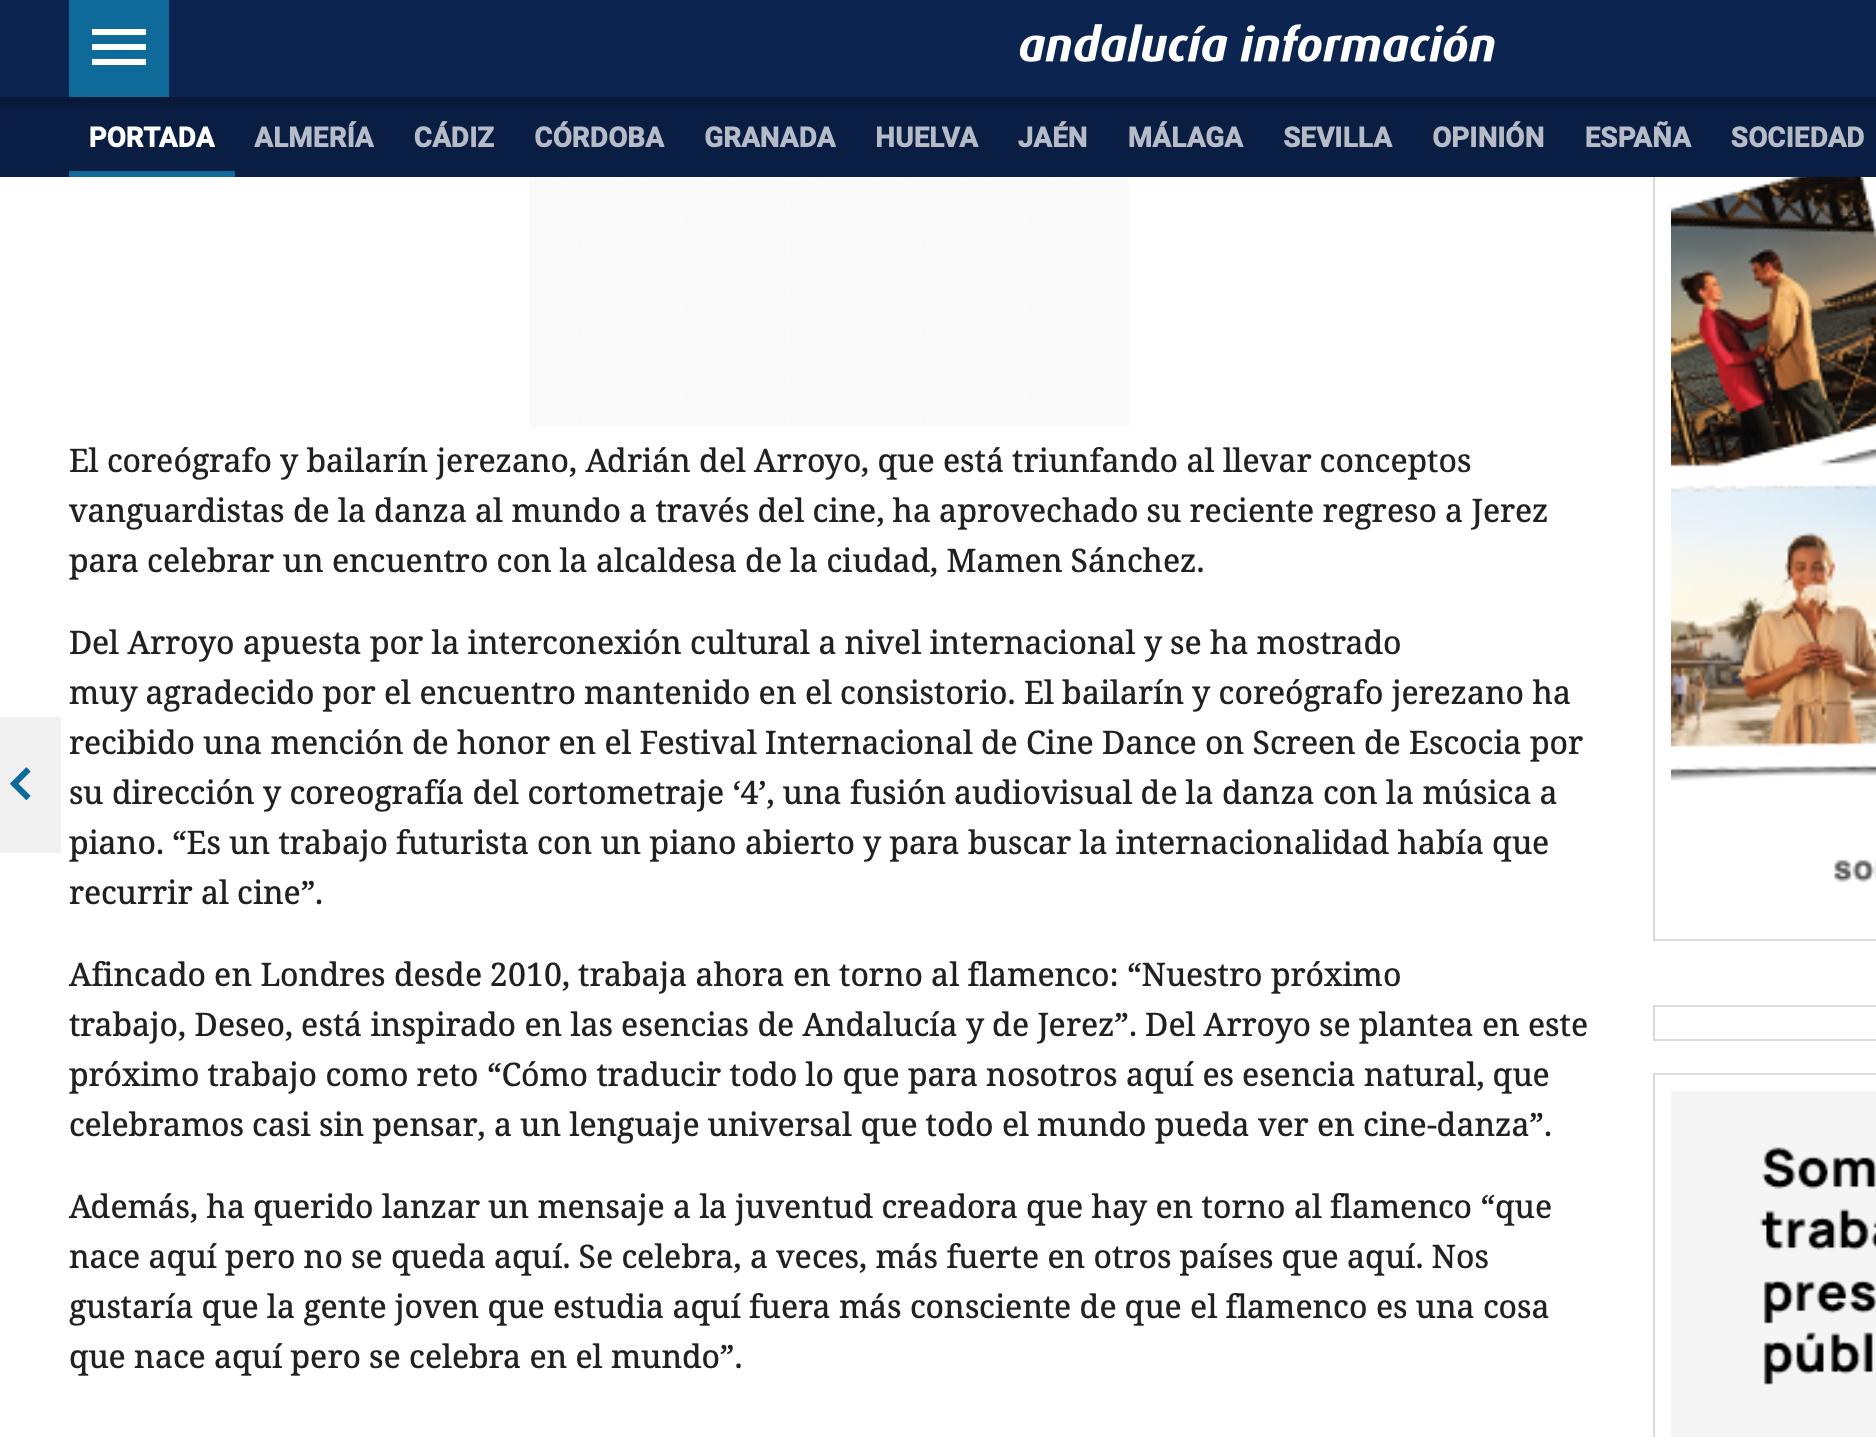 Andalucia 3 Screenshot 2021-05-02 at 19.51.51